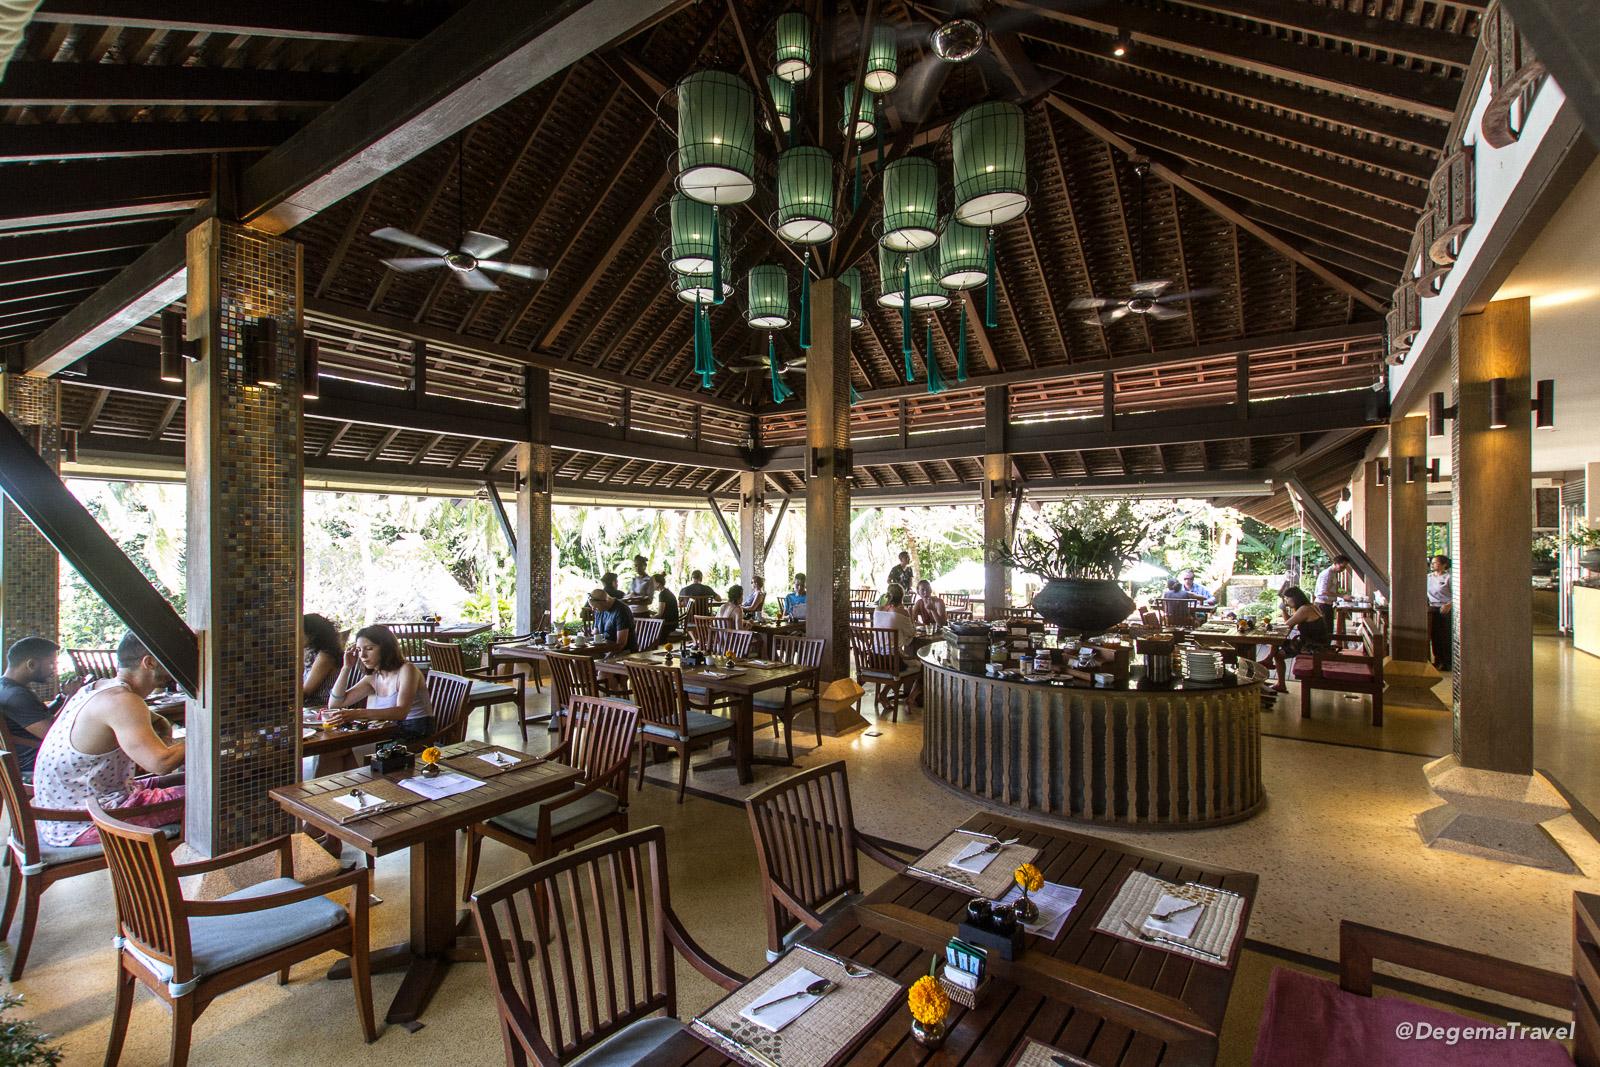 Spice n' Rice Thai Restaurant breakfast buffet at Pimalai Resort & Spa on Koh Lanta, Thailand